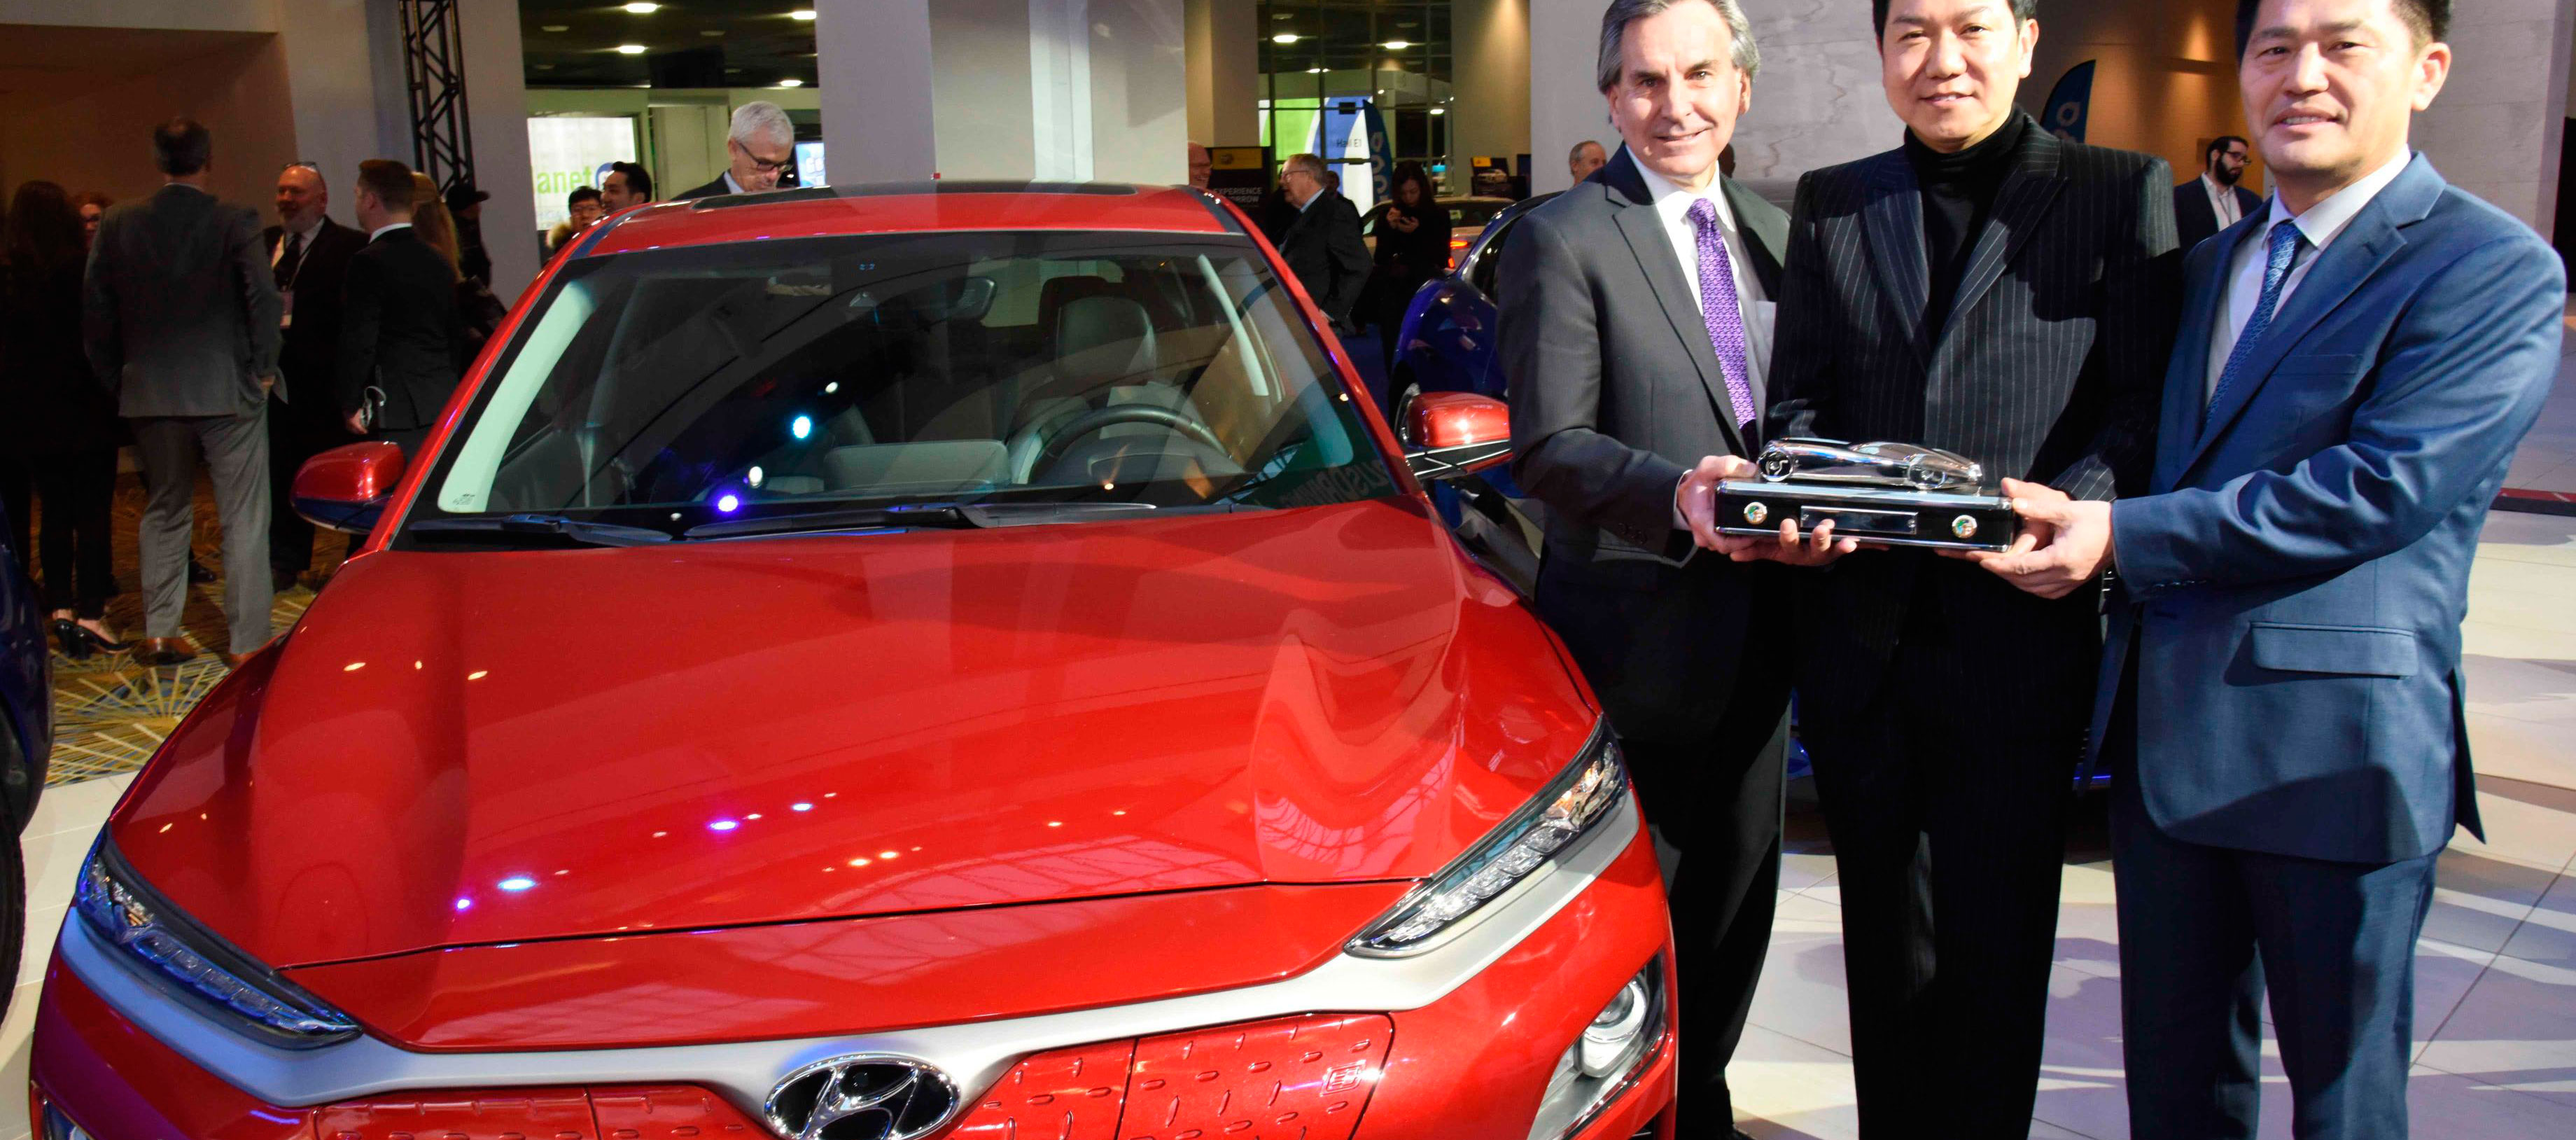 Hyundai Kona, vehículo utilitario Norteamericano de 2019